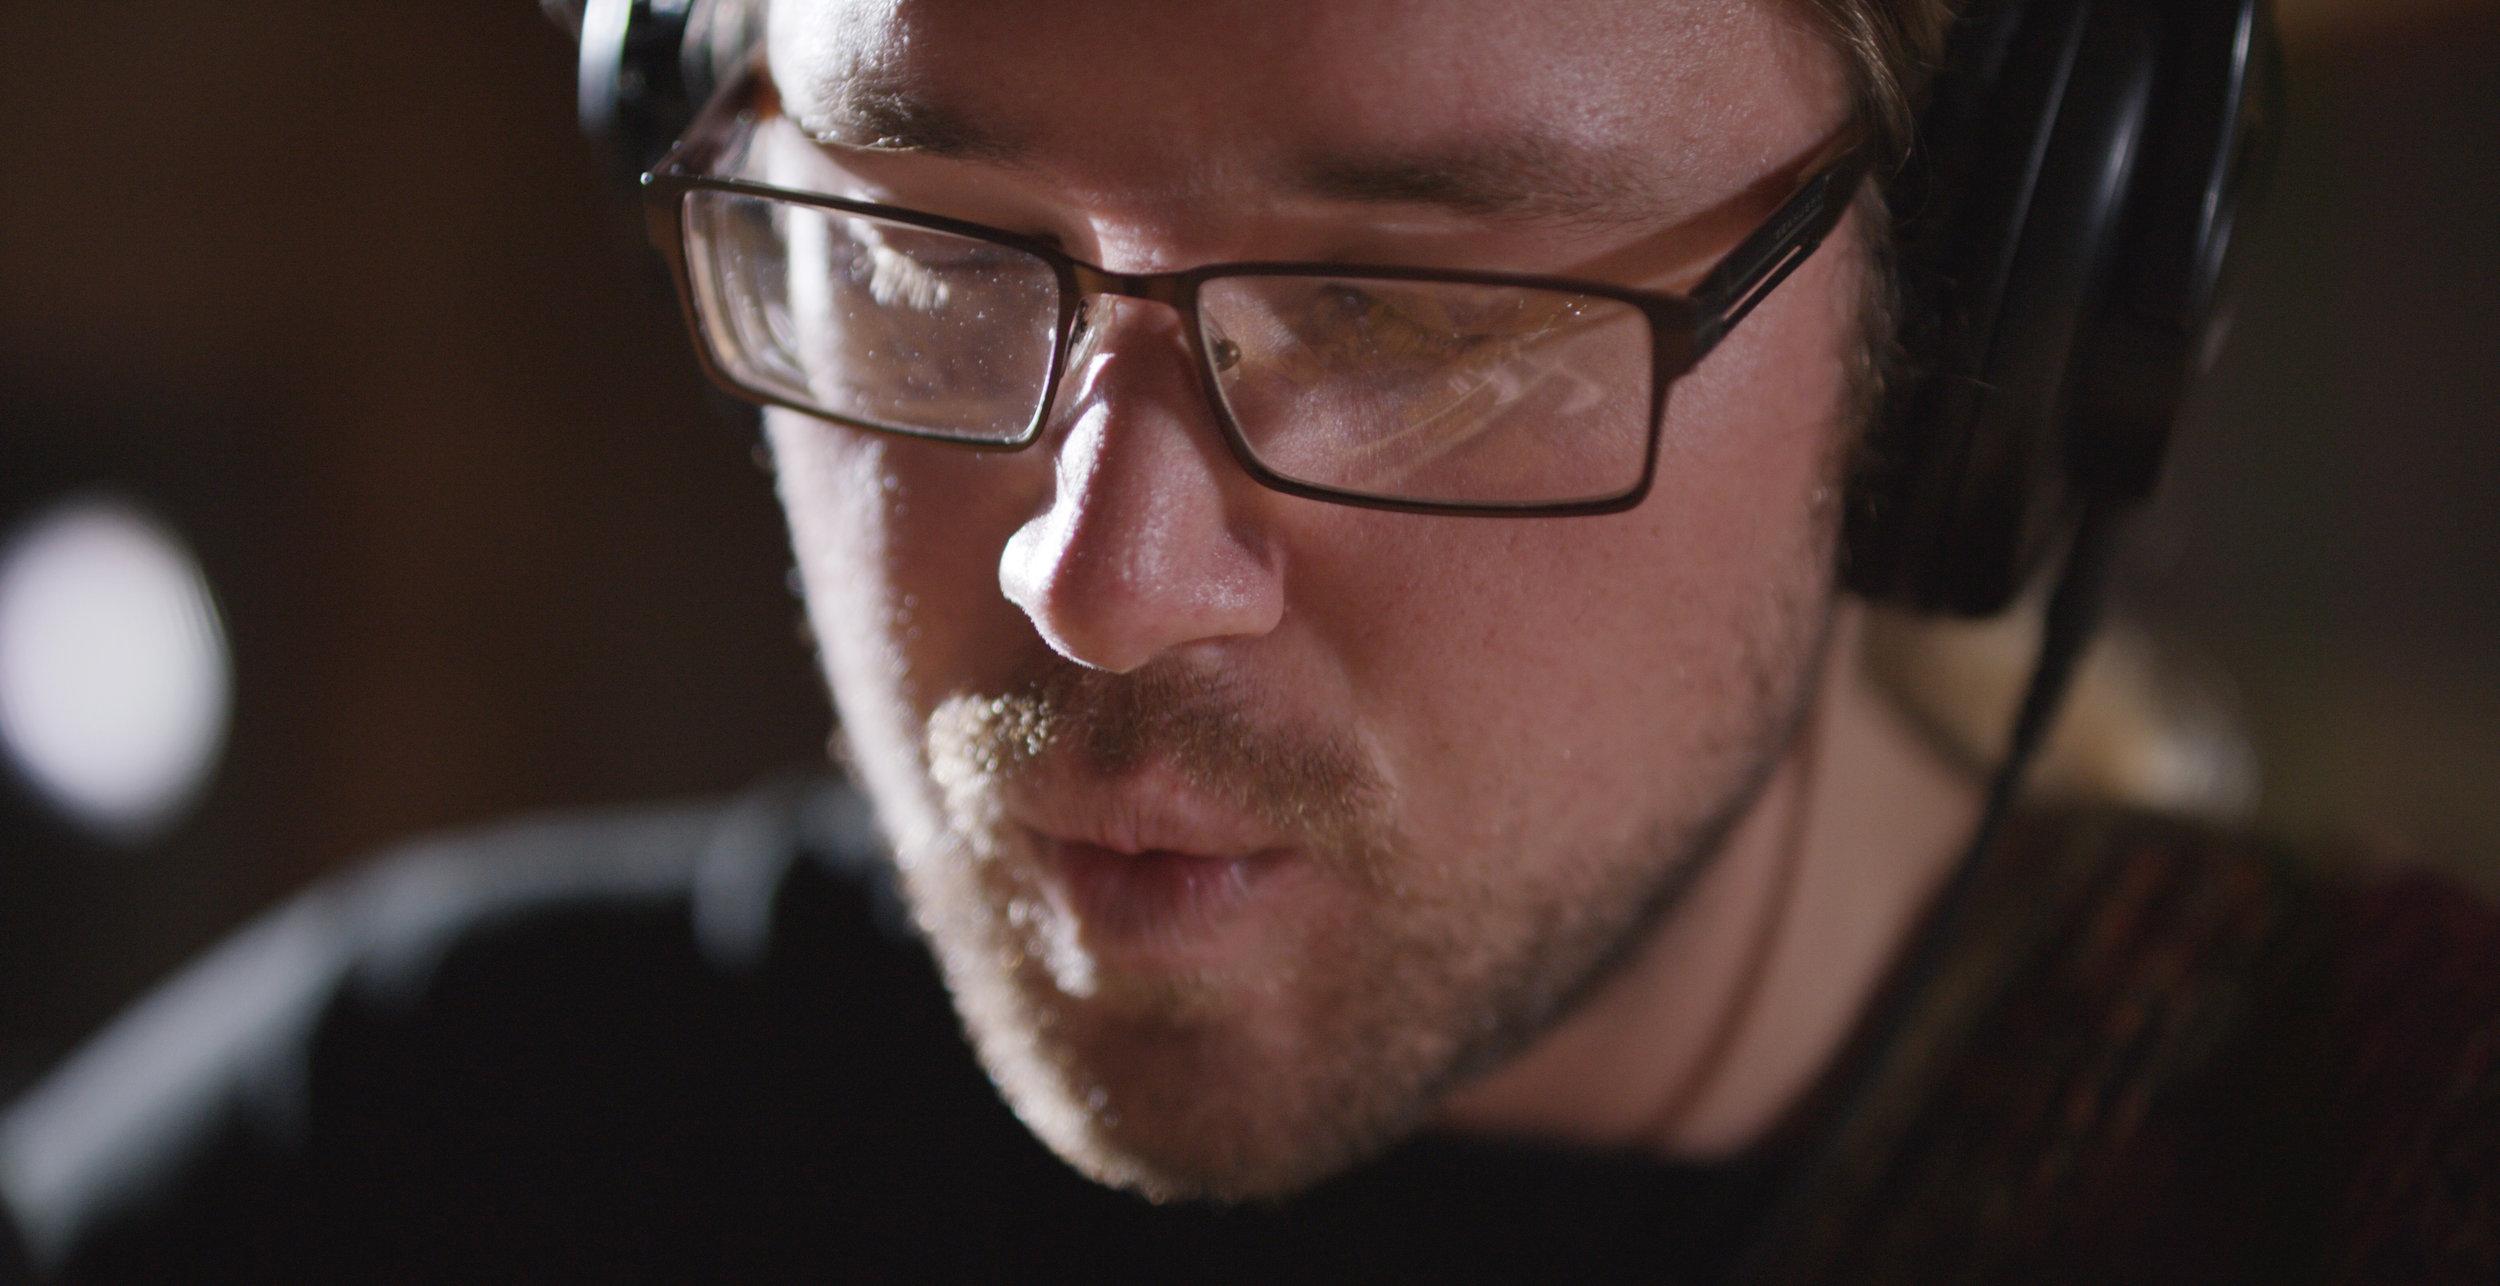 Ian McCormick Live session at Studio West shot 2